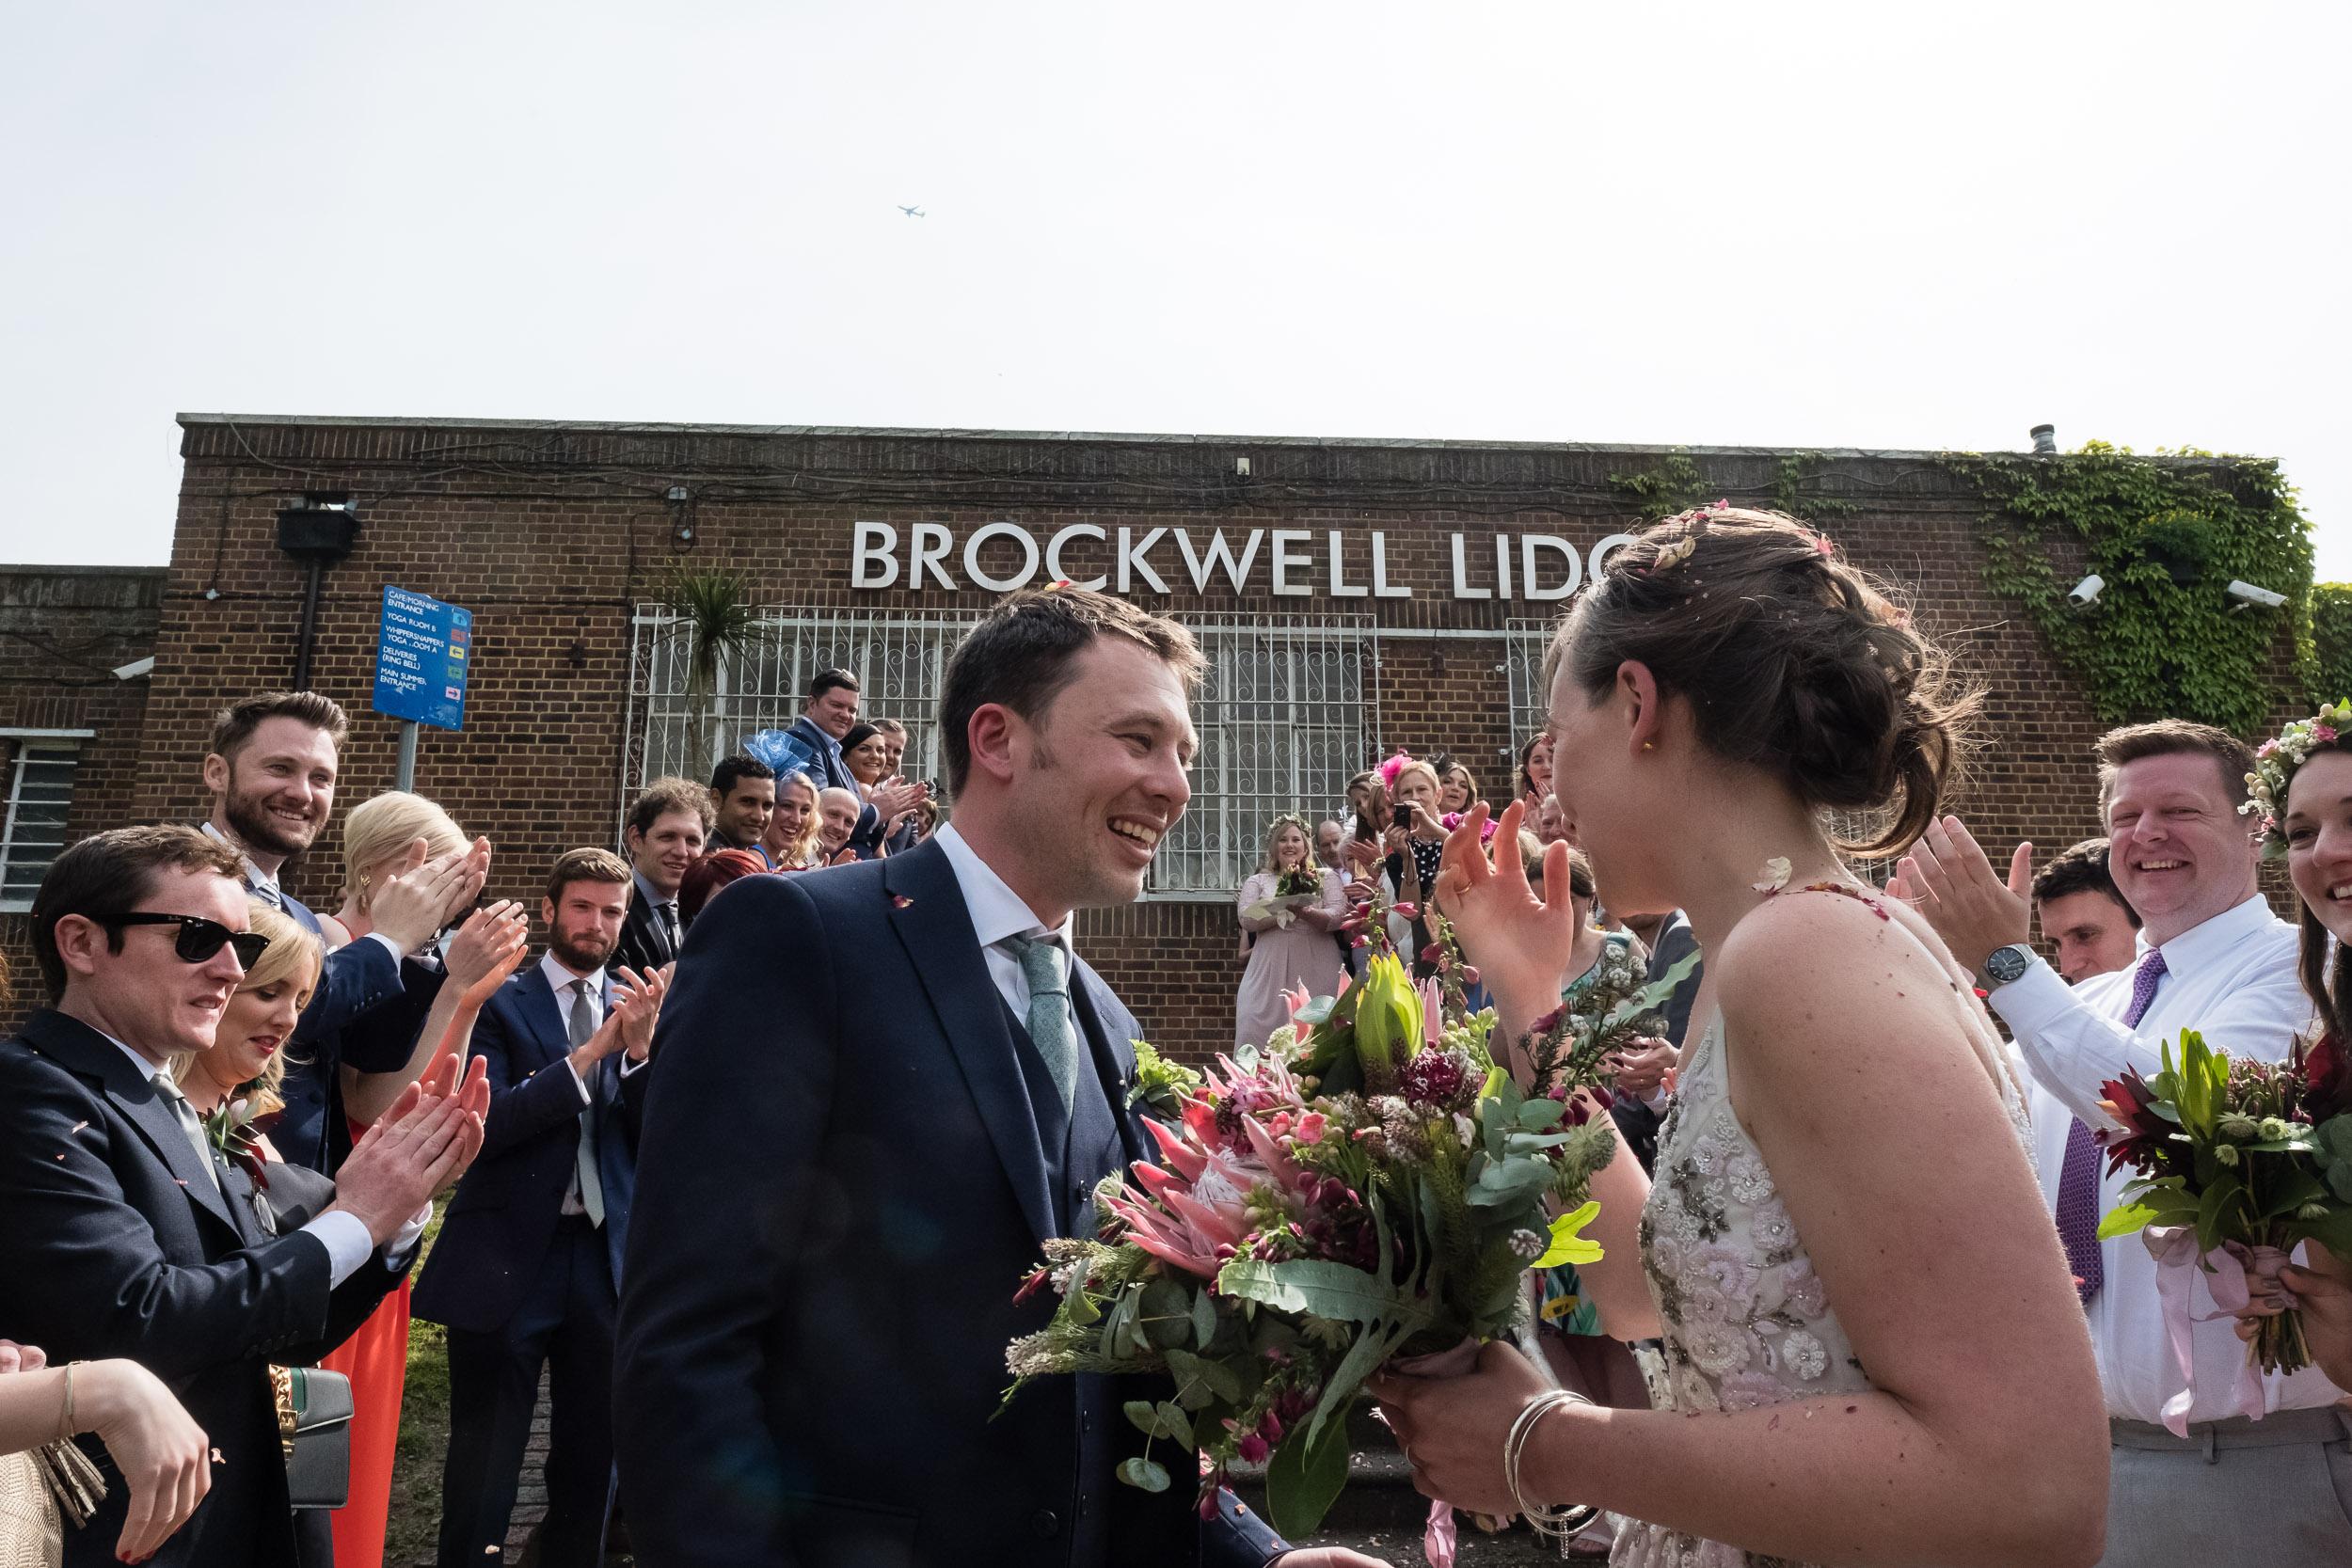 brockwell-lido-brixton-herne-hill-wedding-220.jpg